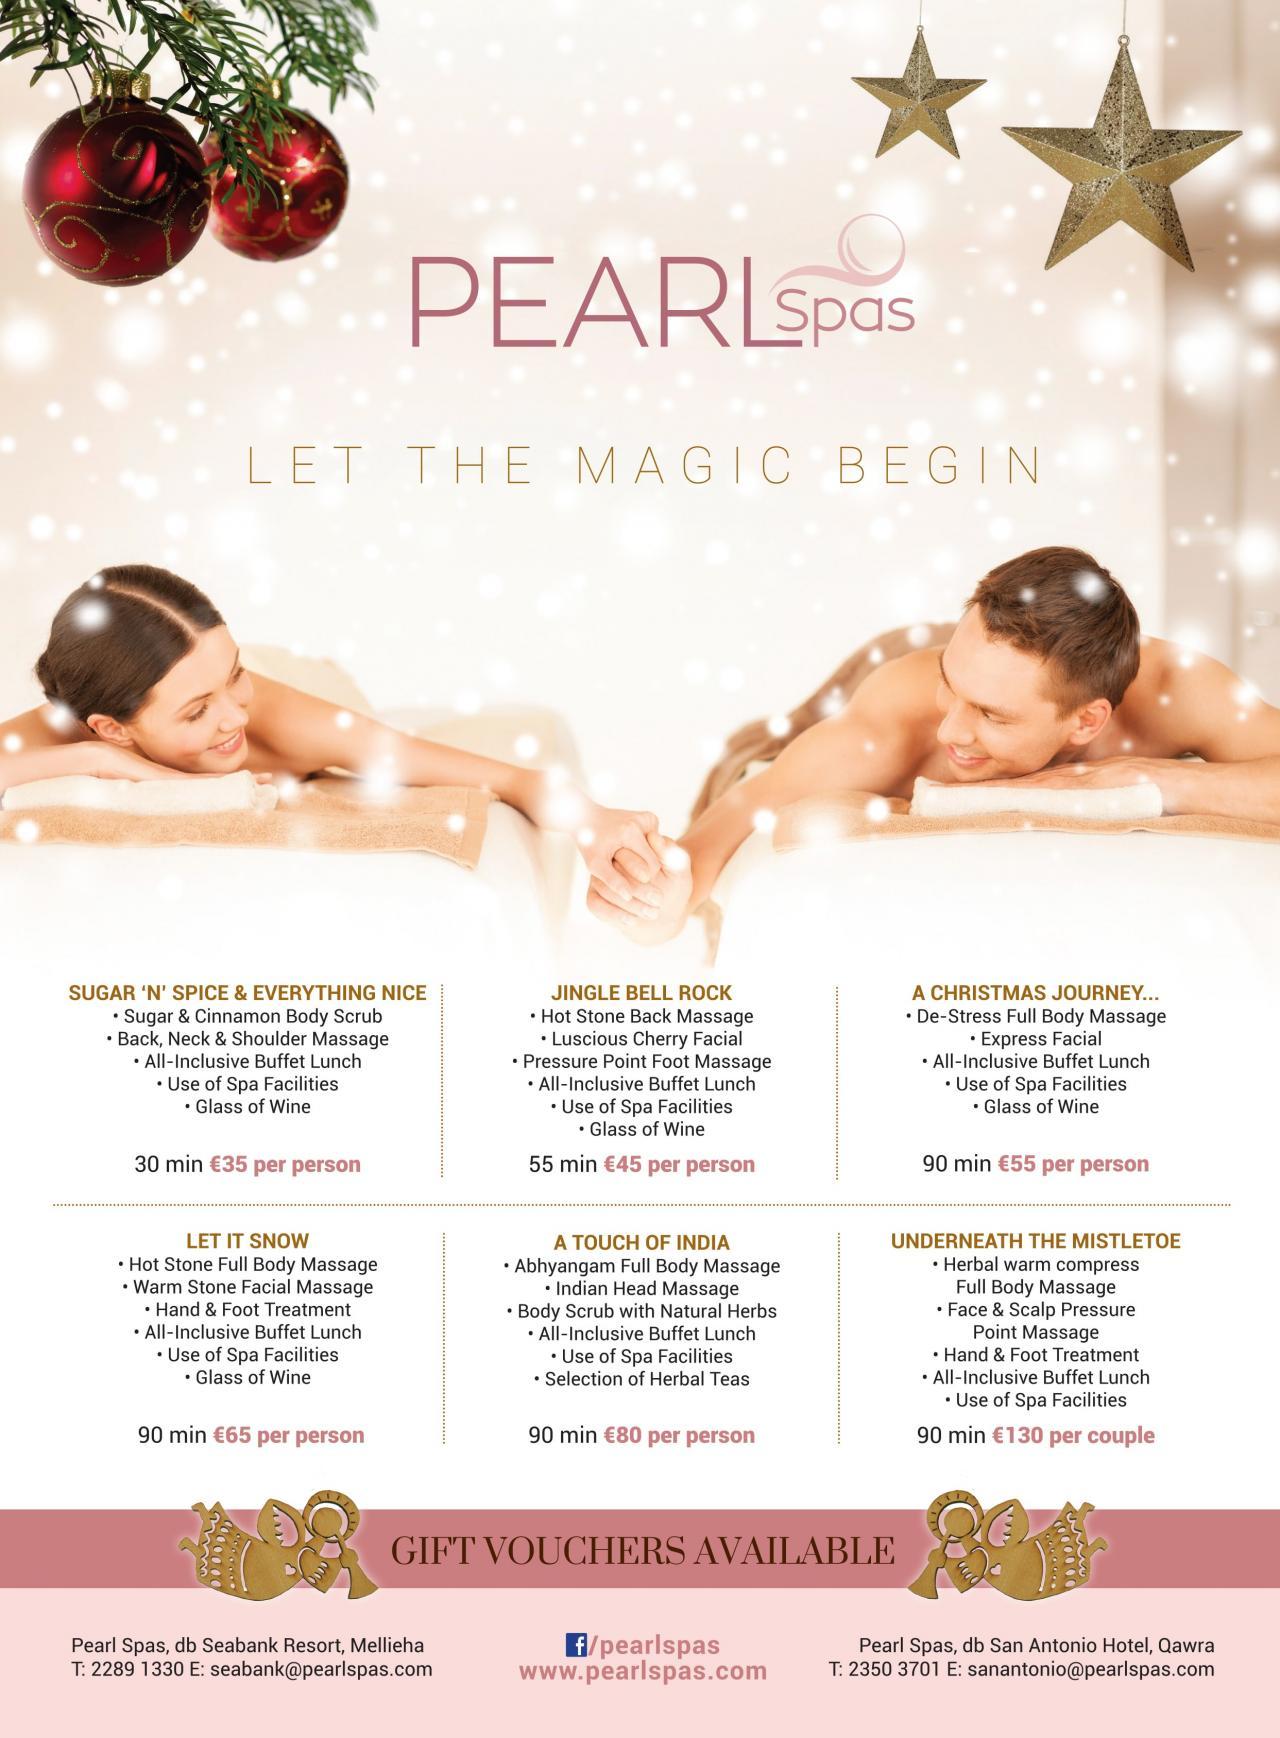 Christmas Spa Packages.Let The Magic Begin At Pearl Spas Db San Antonio Hotel